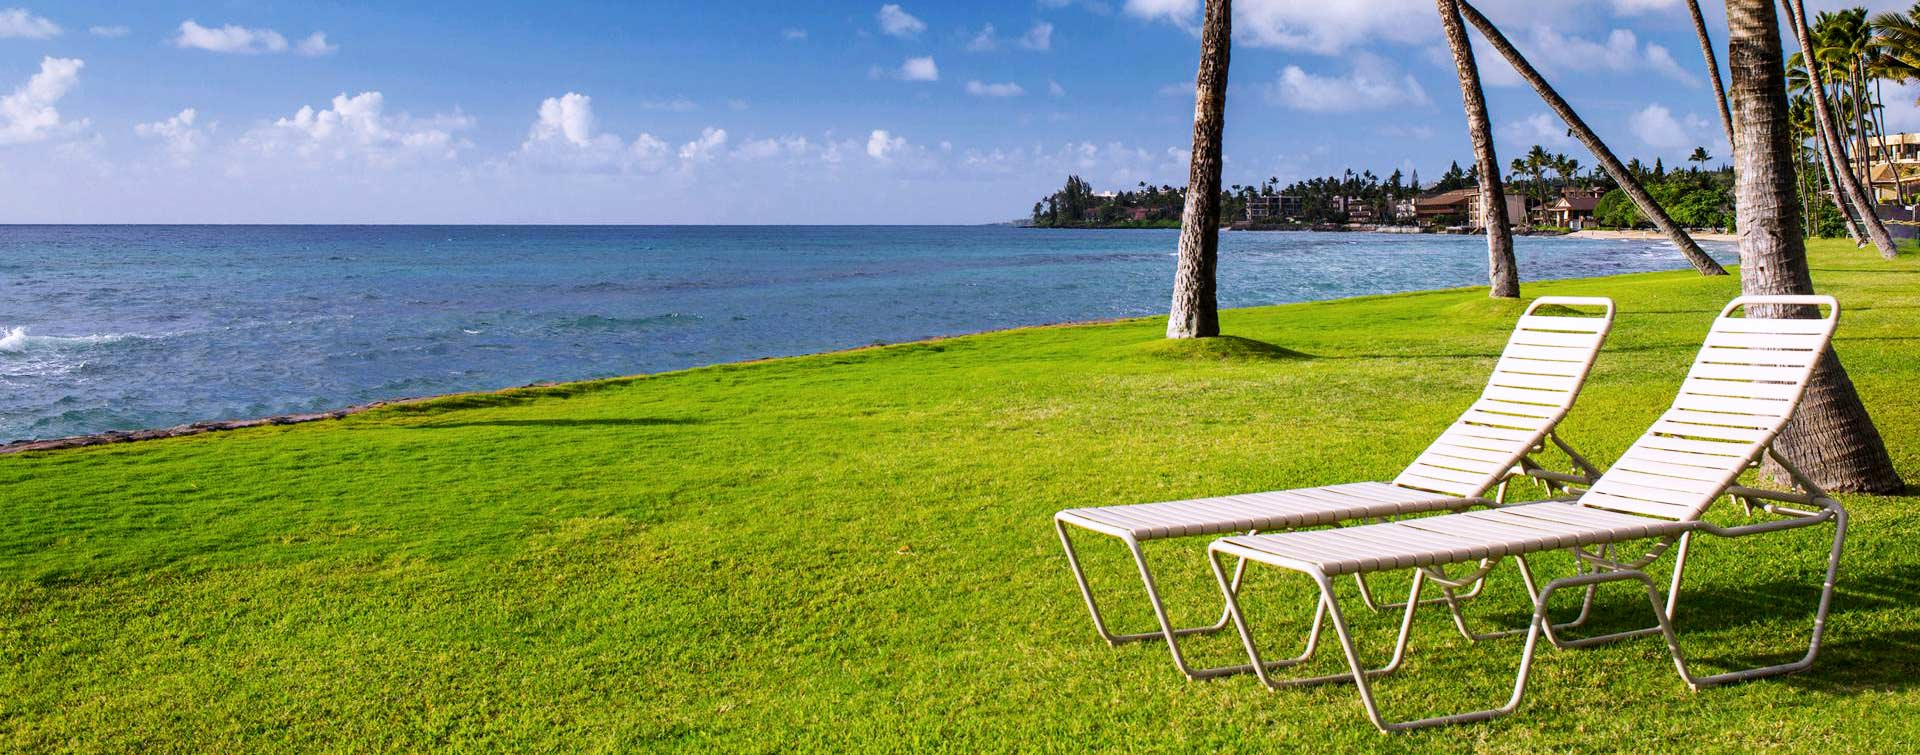 Maui Resorts   Aston at Papakea Resort Official Site